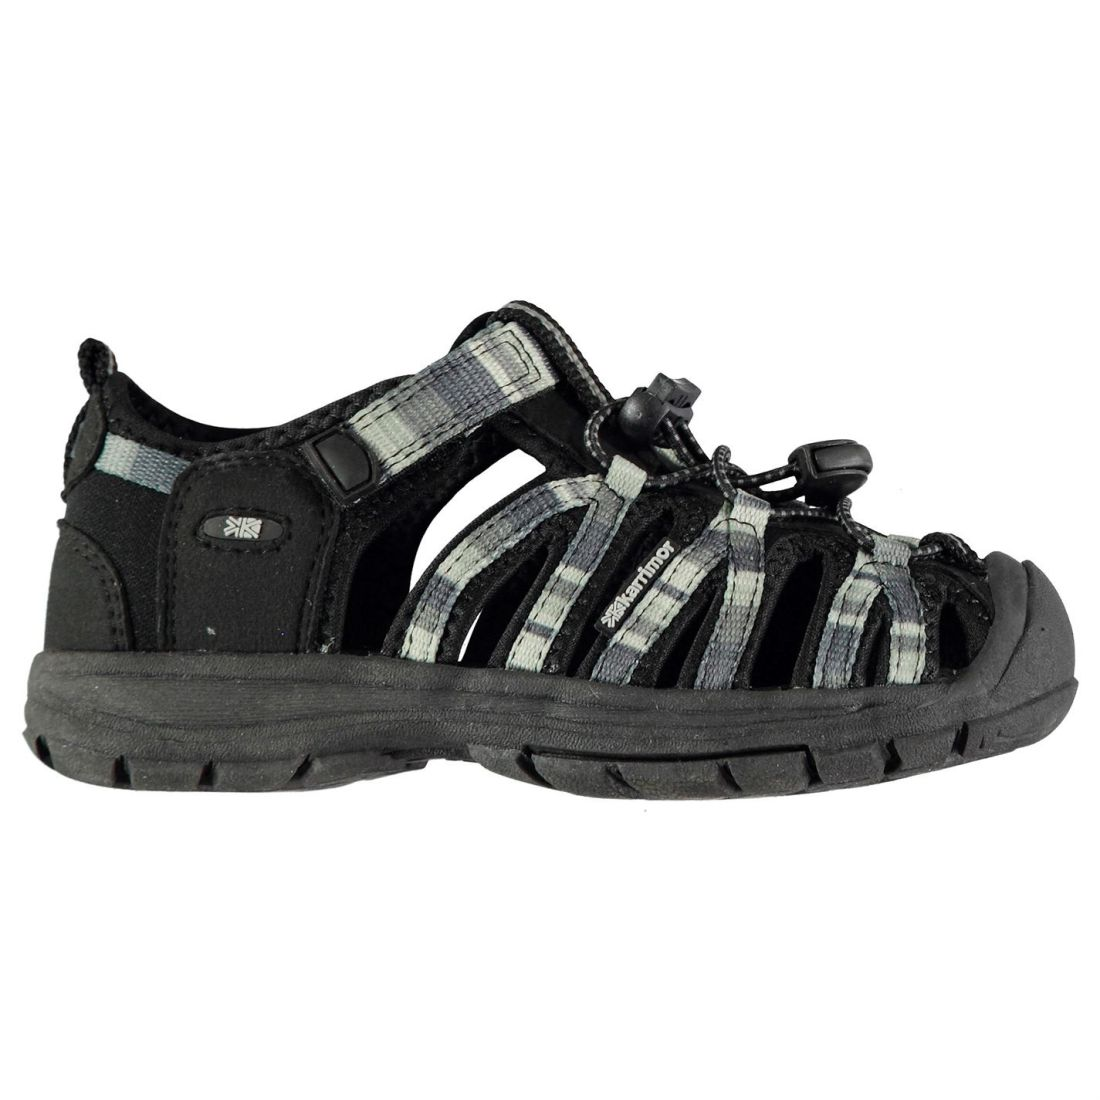 7f9bd488e1e3 Karrimor Ithaca Chds83 Childrens Sandals